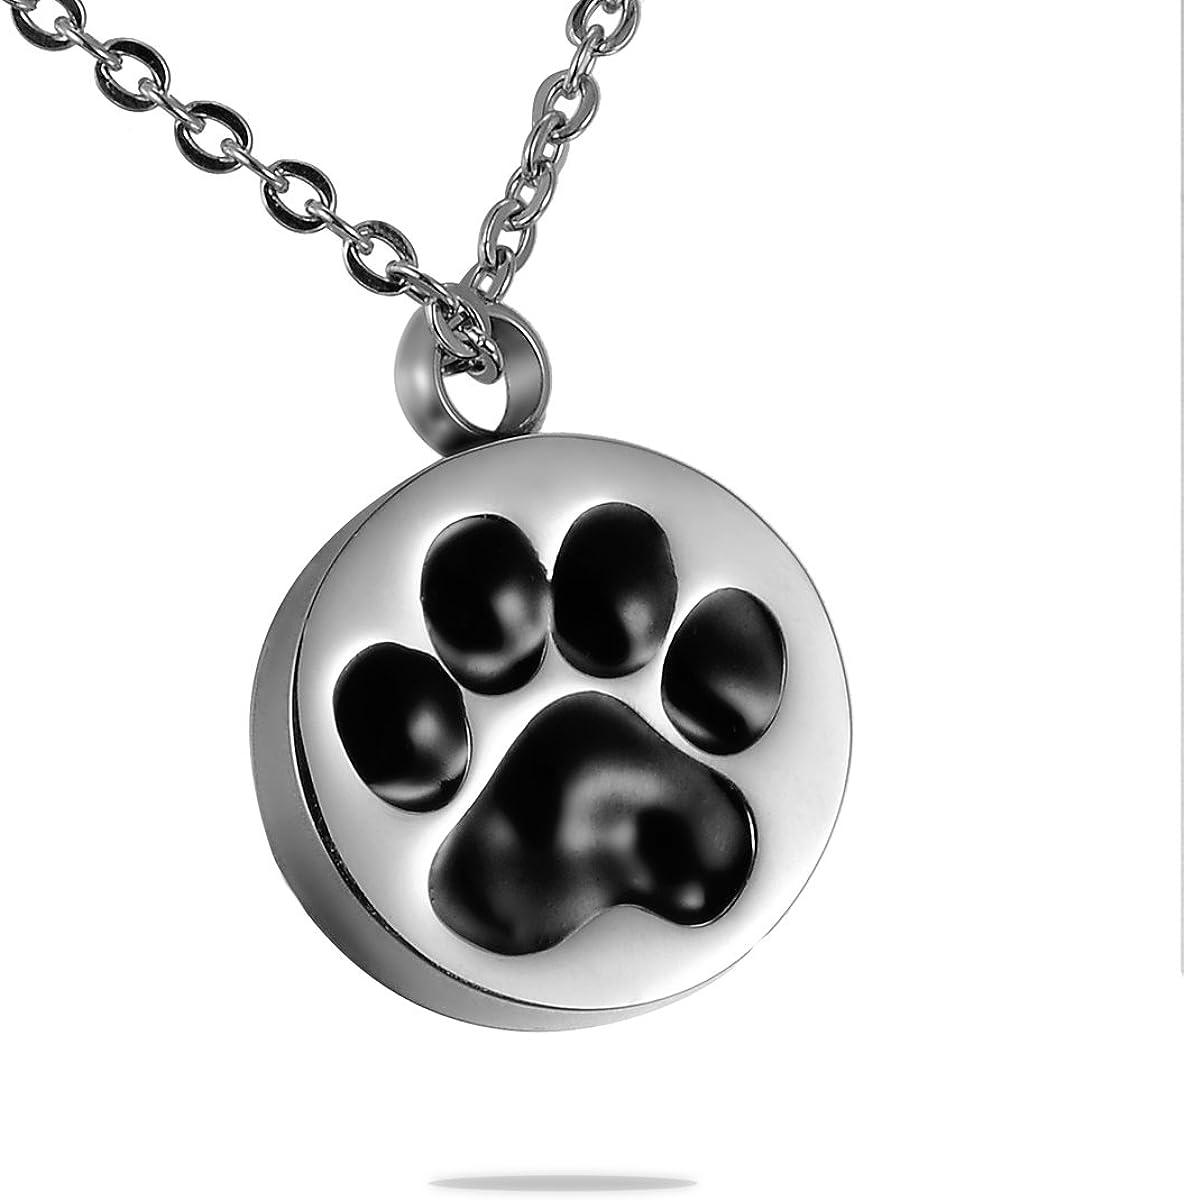 KEEPSAKE PENDANT ASHES FUR CHARM ROUND PAWPRINT PET DOG CREMATION URN NECKLACE